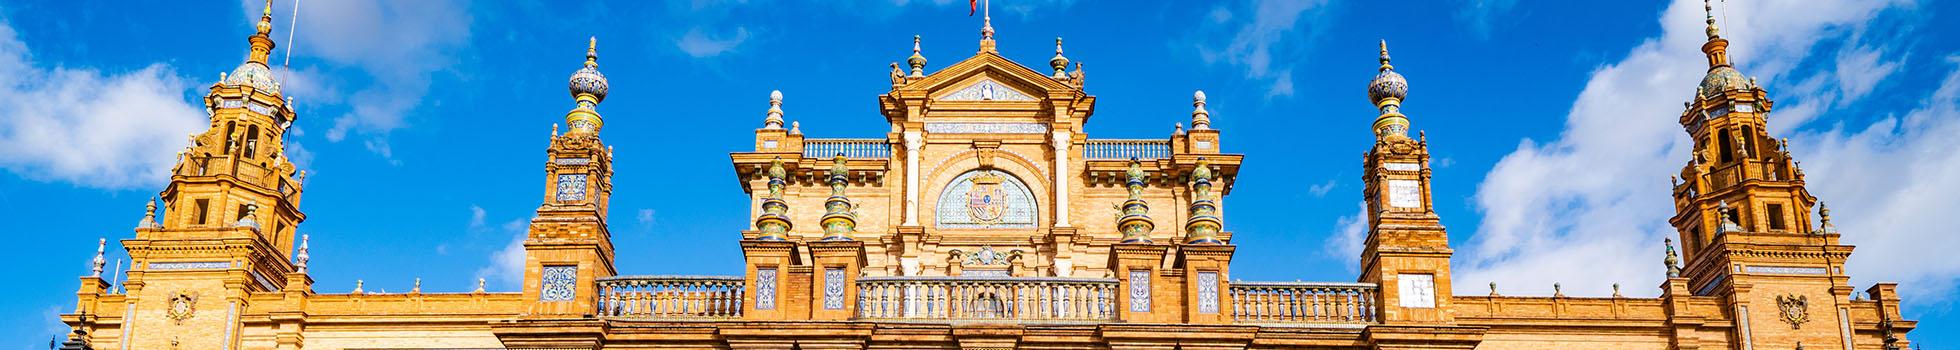 Placa Esapana, Seville